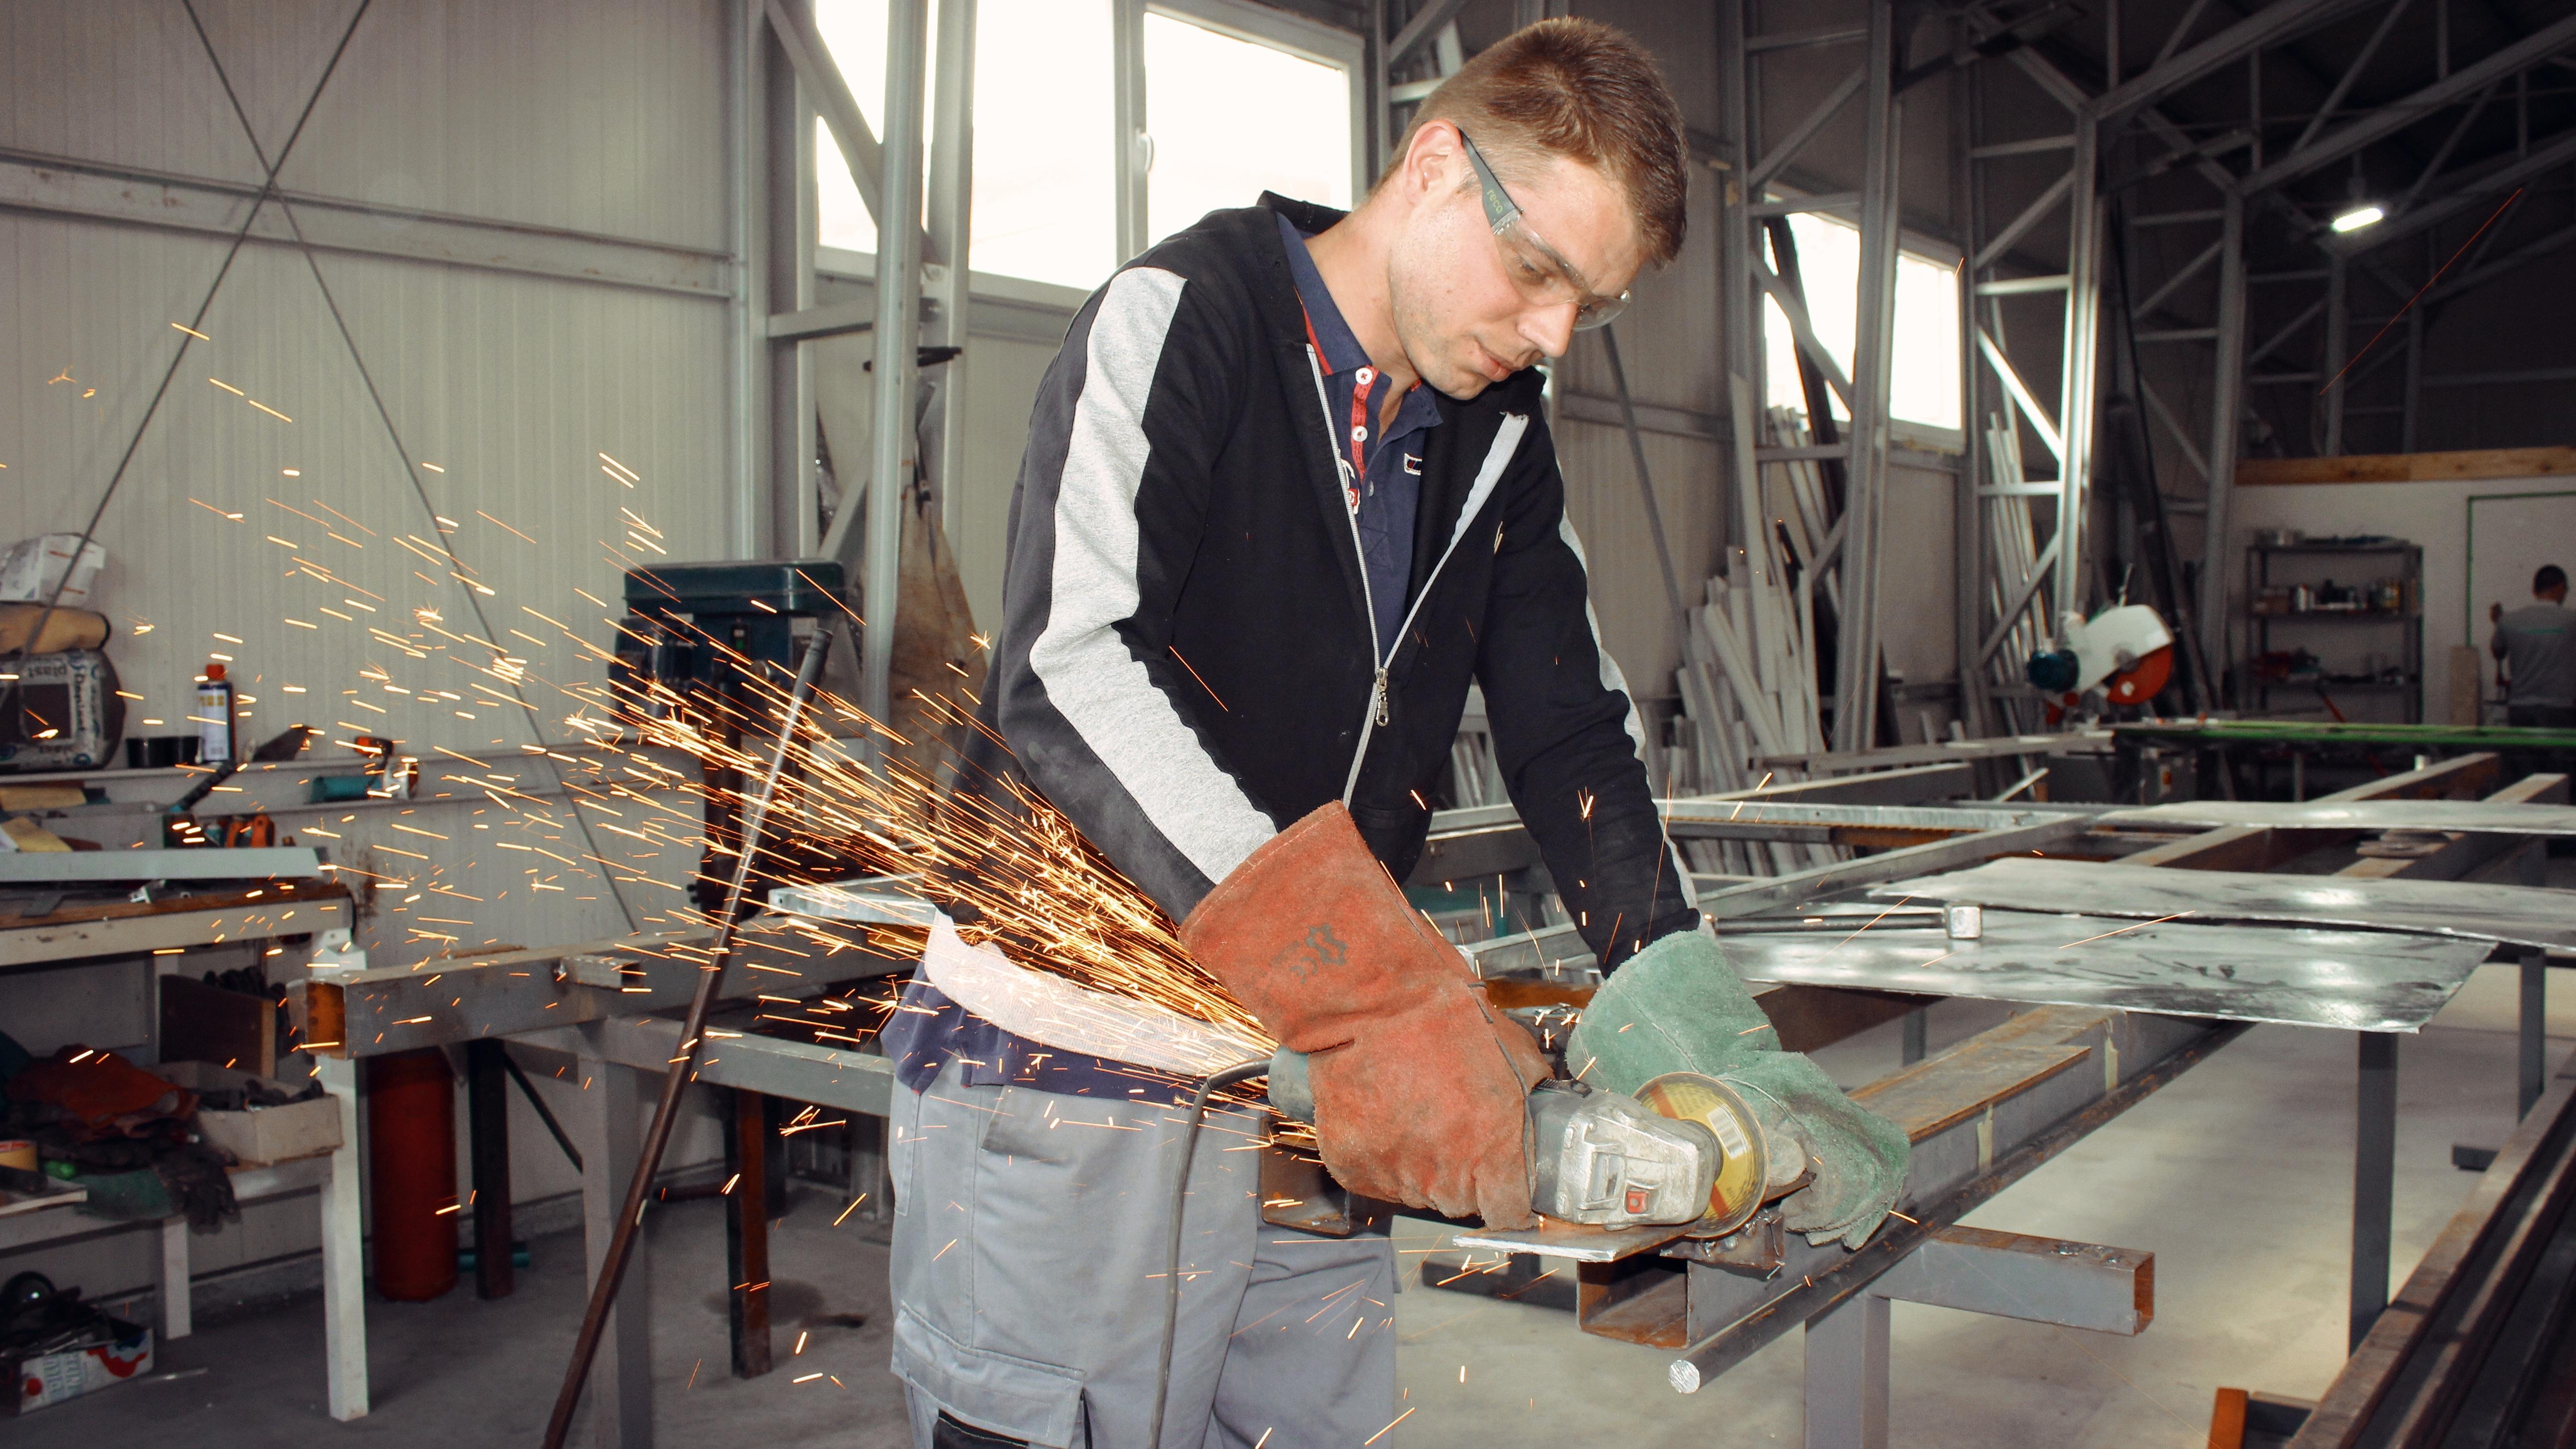 work man tool construction repair industrial industry professional worker art grinder tools job master technician sense